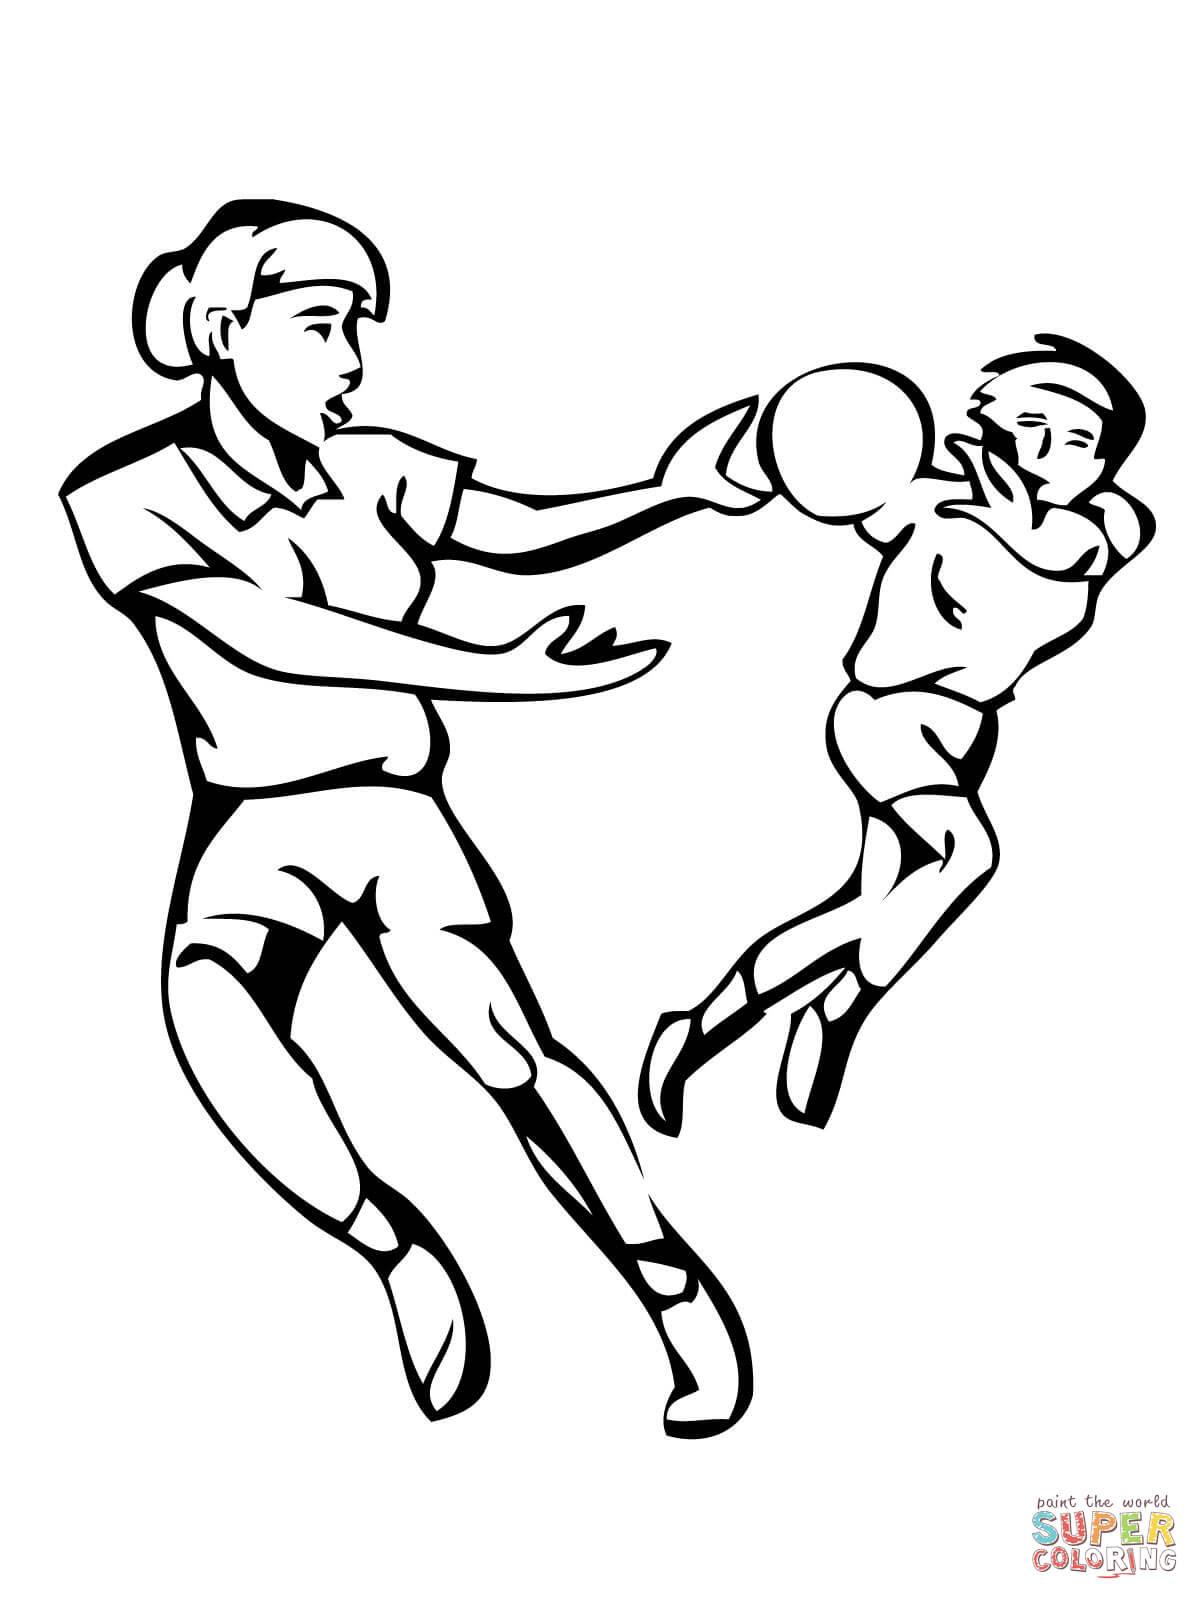 Klick das Bild Handball Match